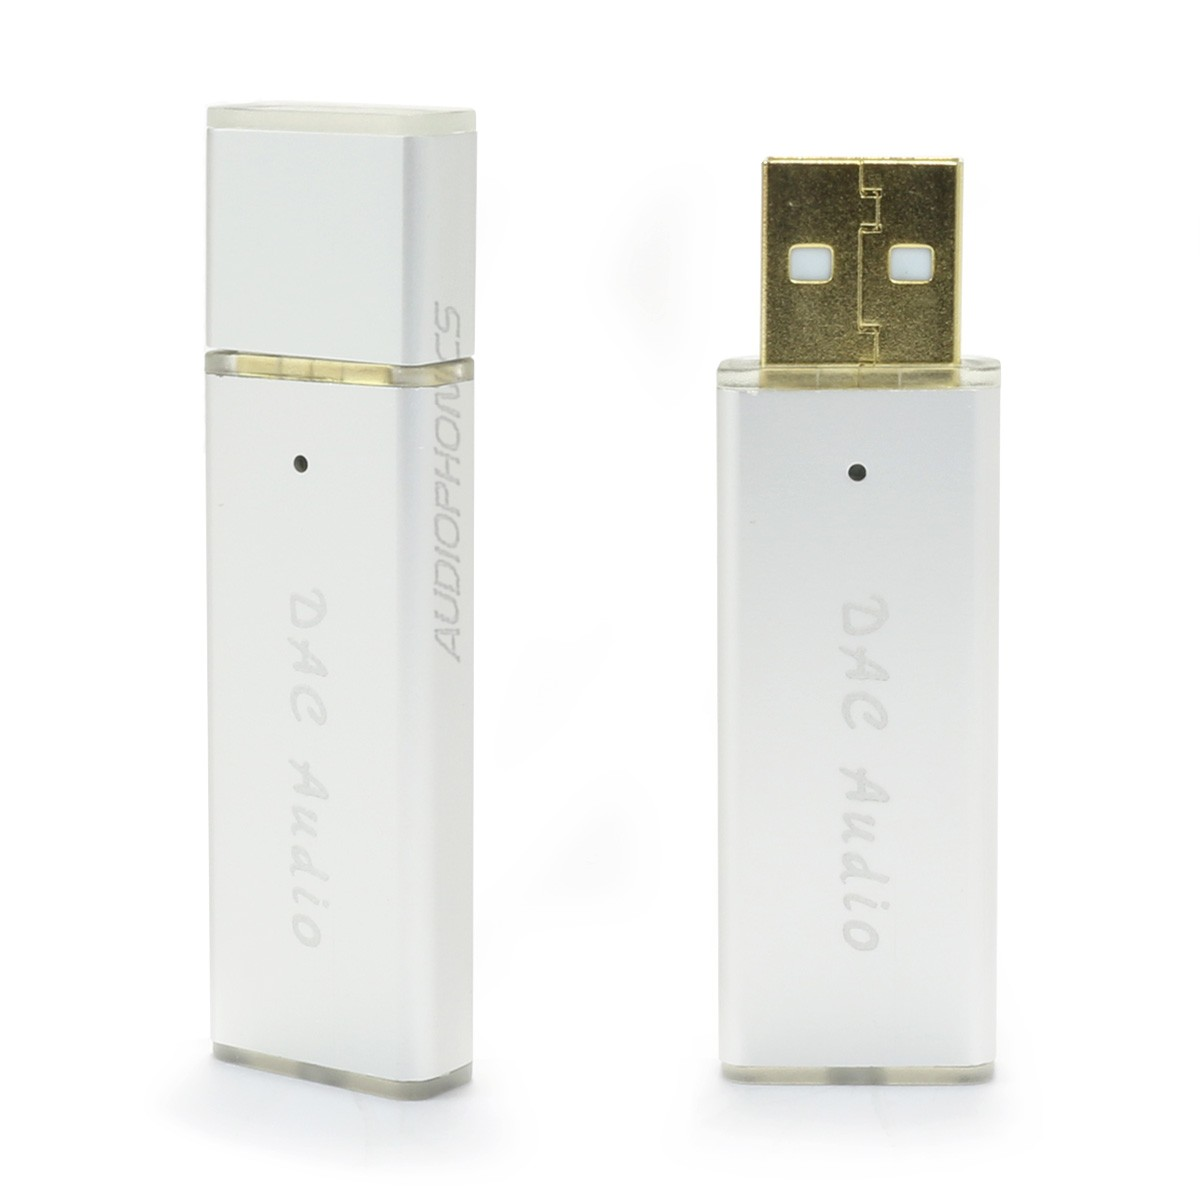 Headphone USB DAC & Amplifier ES9018K2M TPA6133A2 OTG 24bit 96kHz